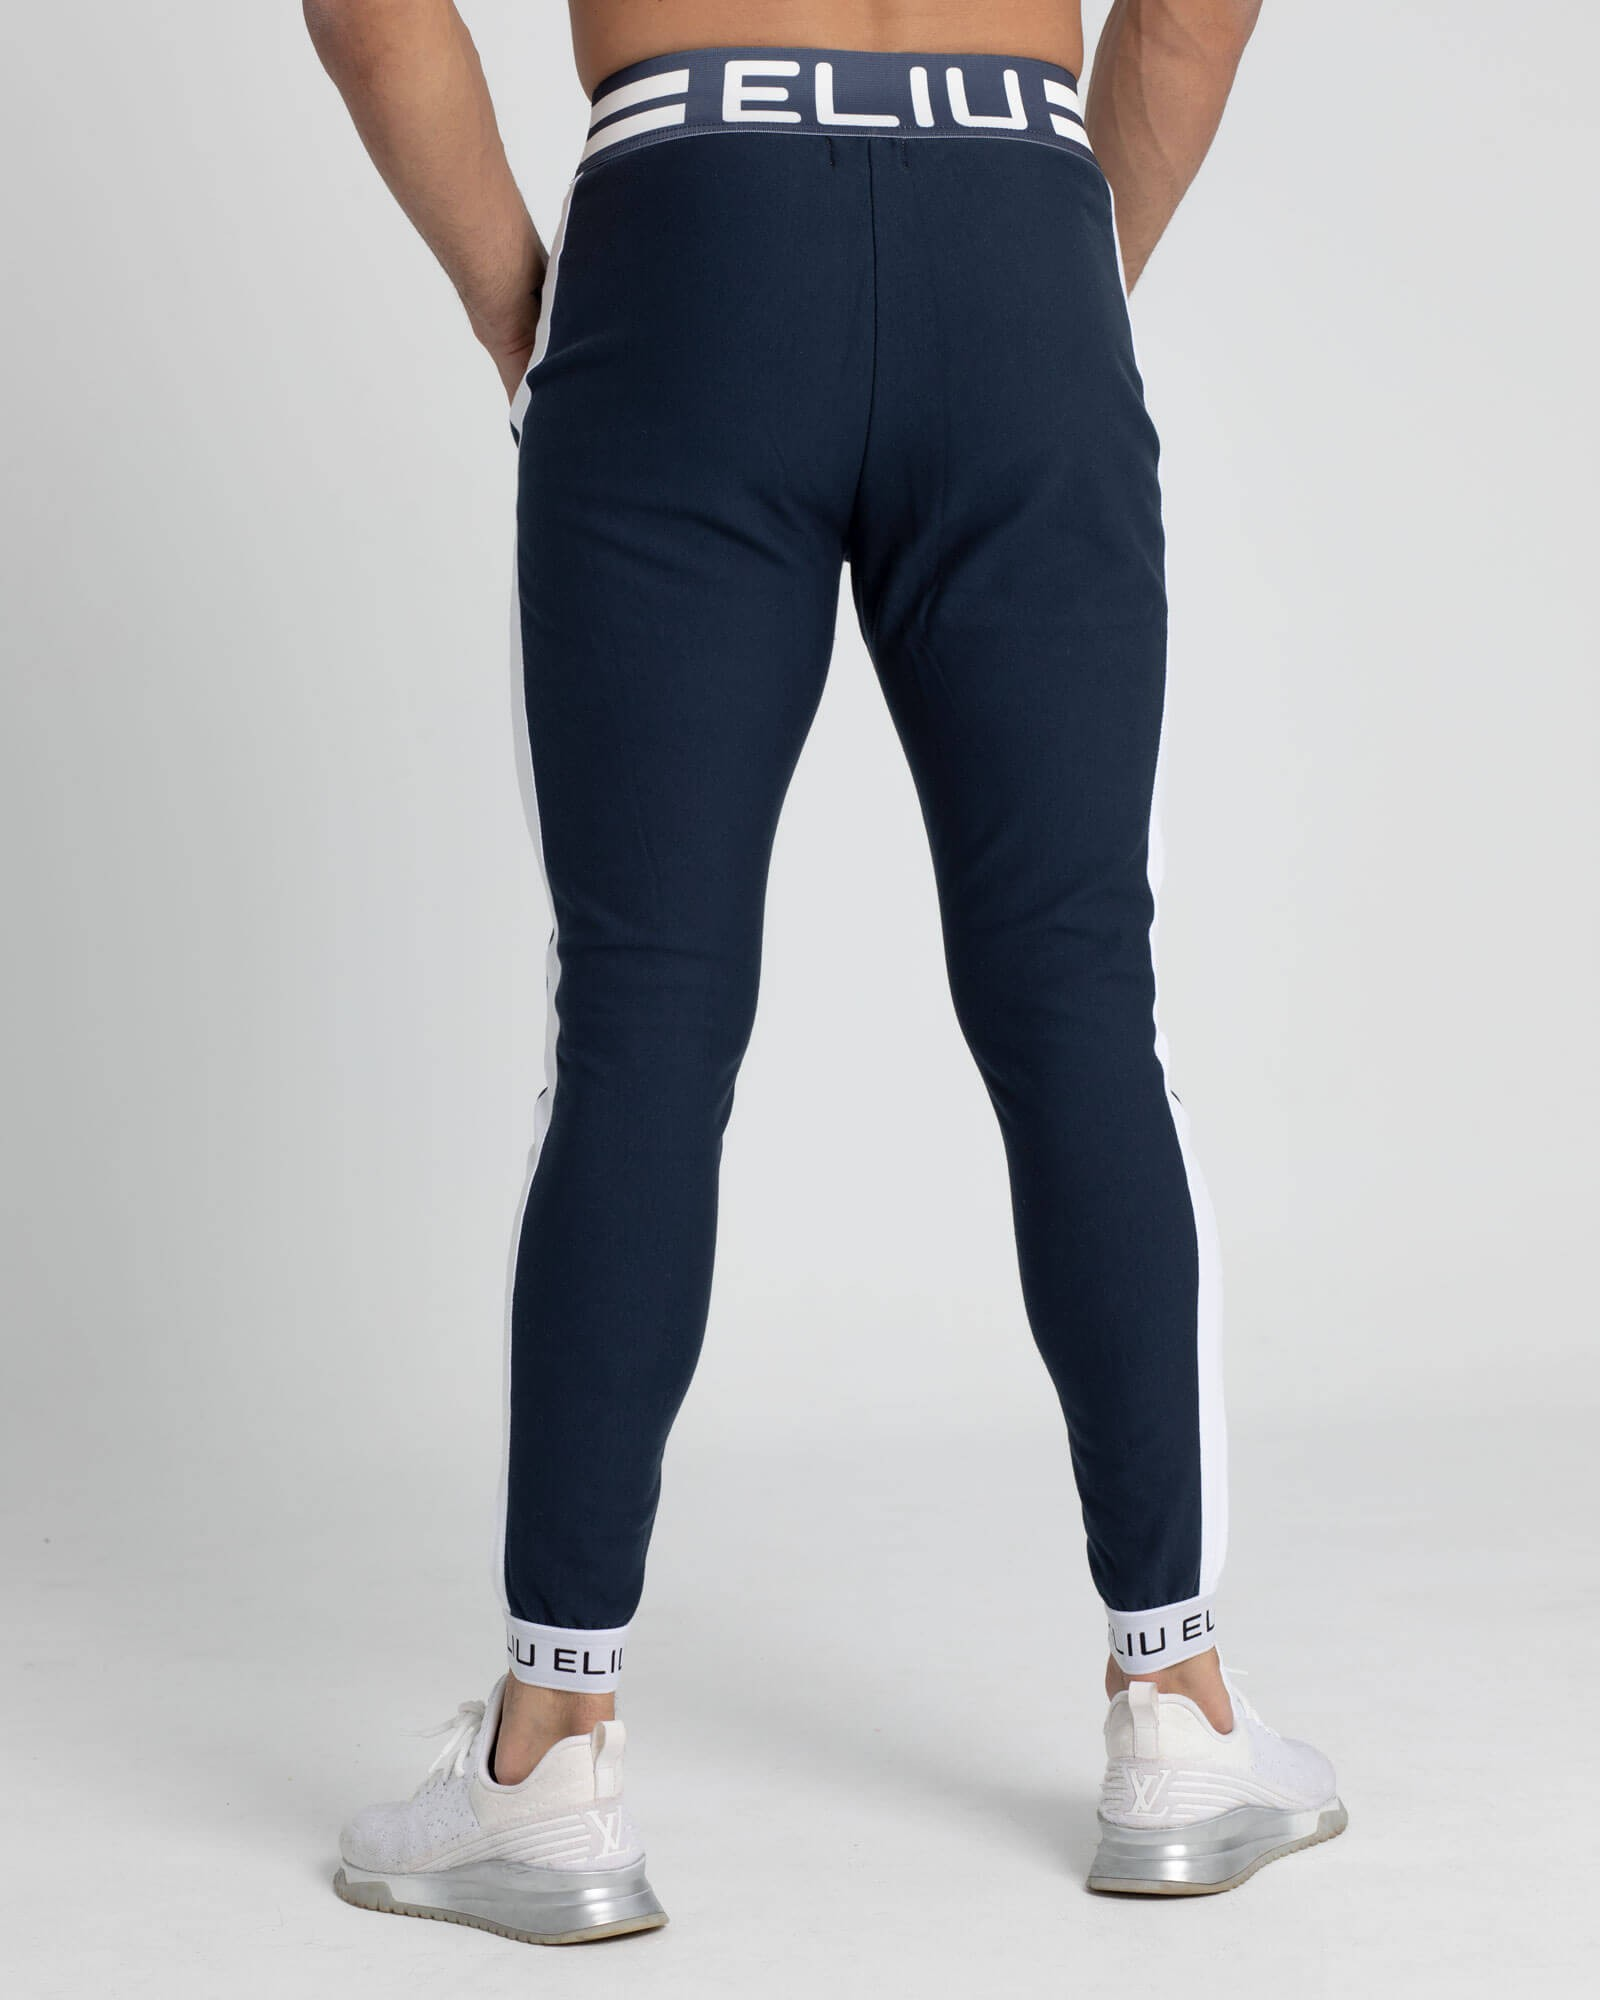 Pantalones de chándal azul marino. Estilo urbano de ELIU streetwear.